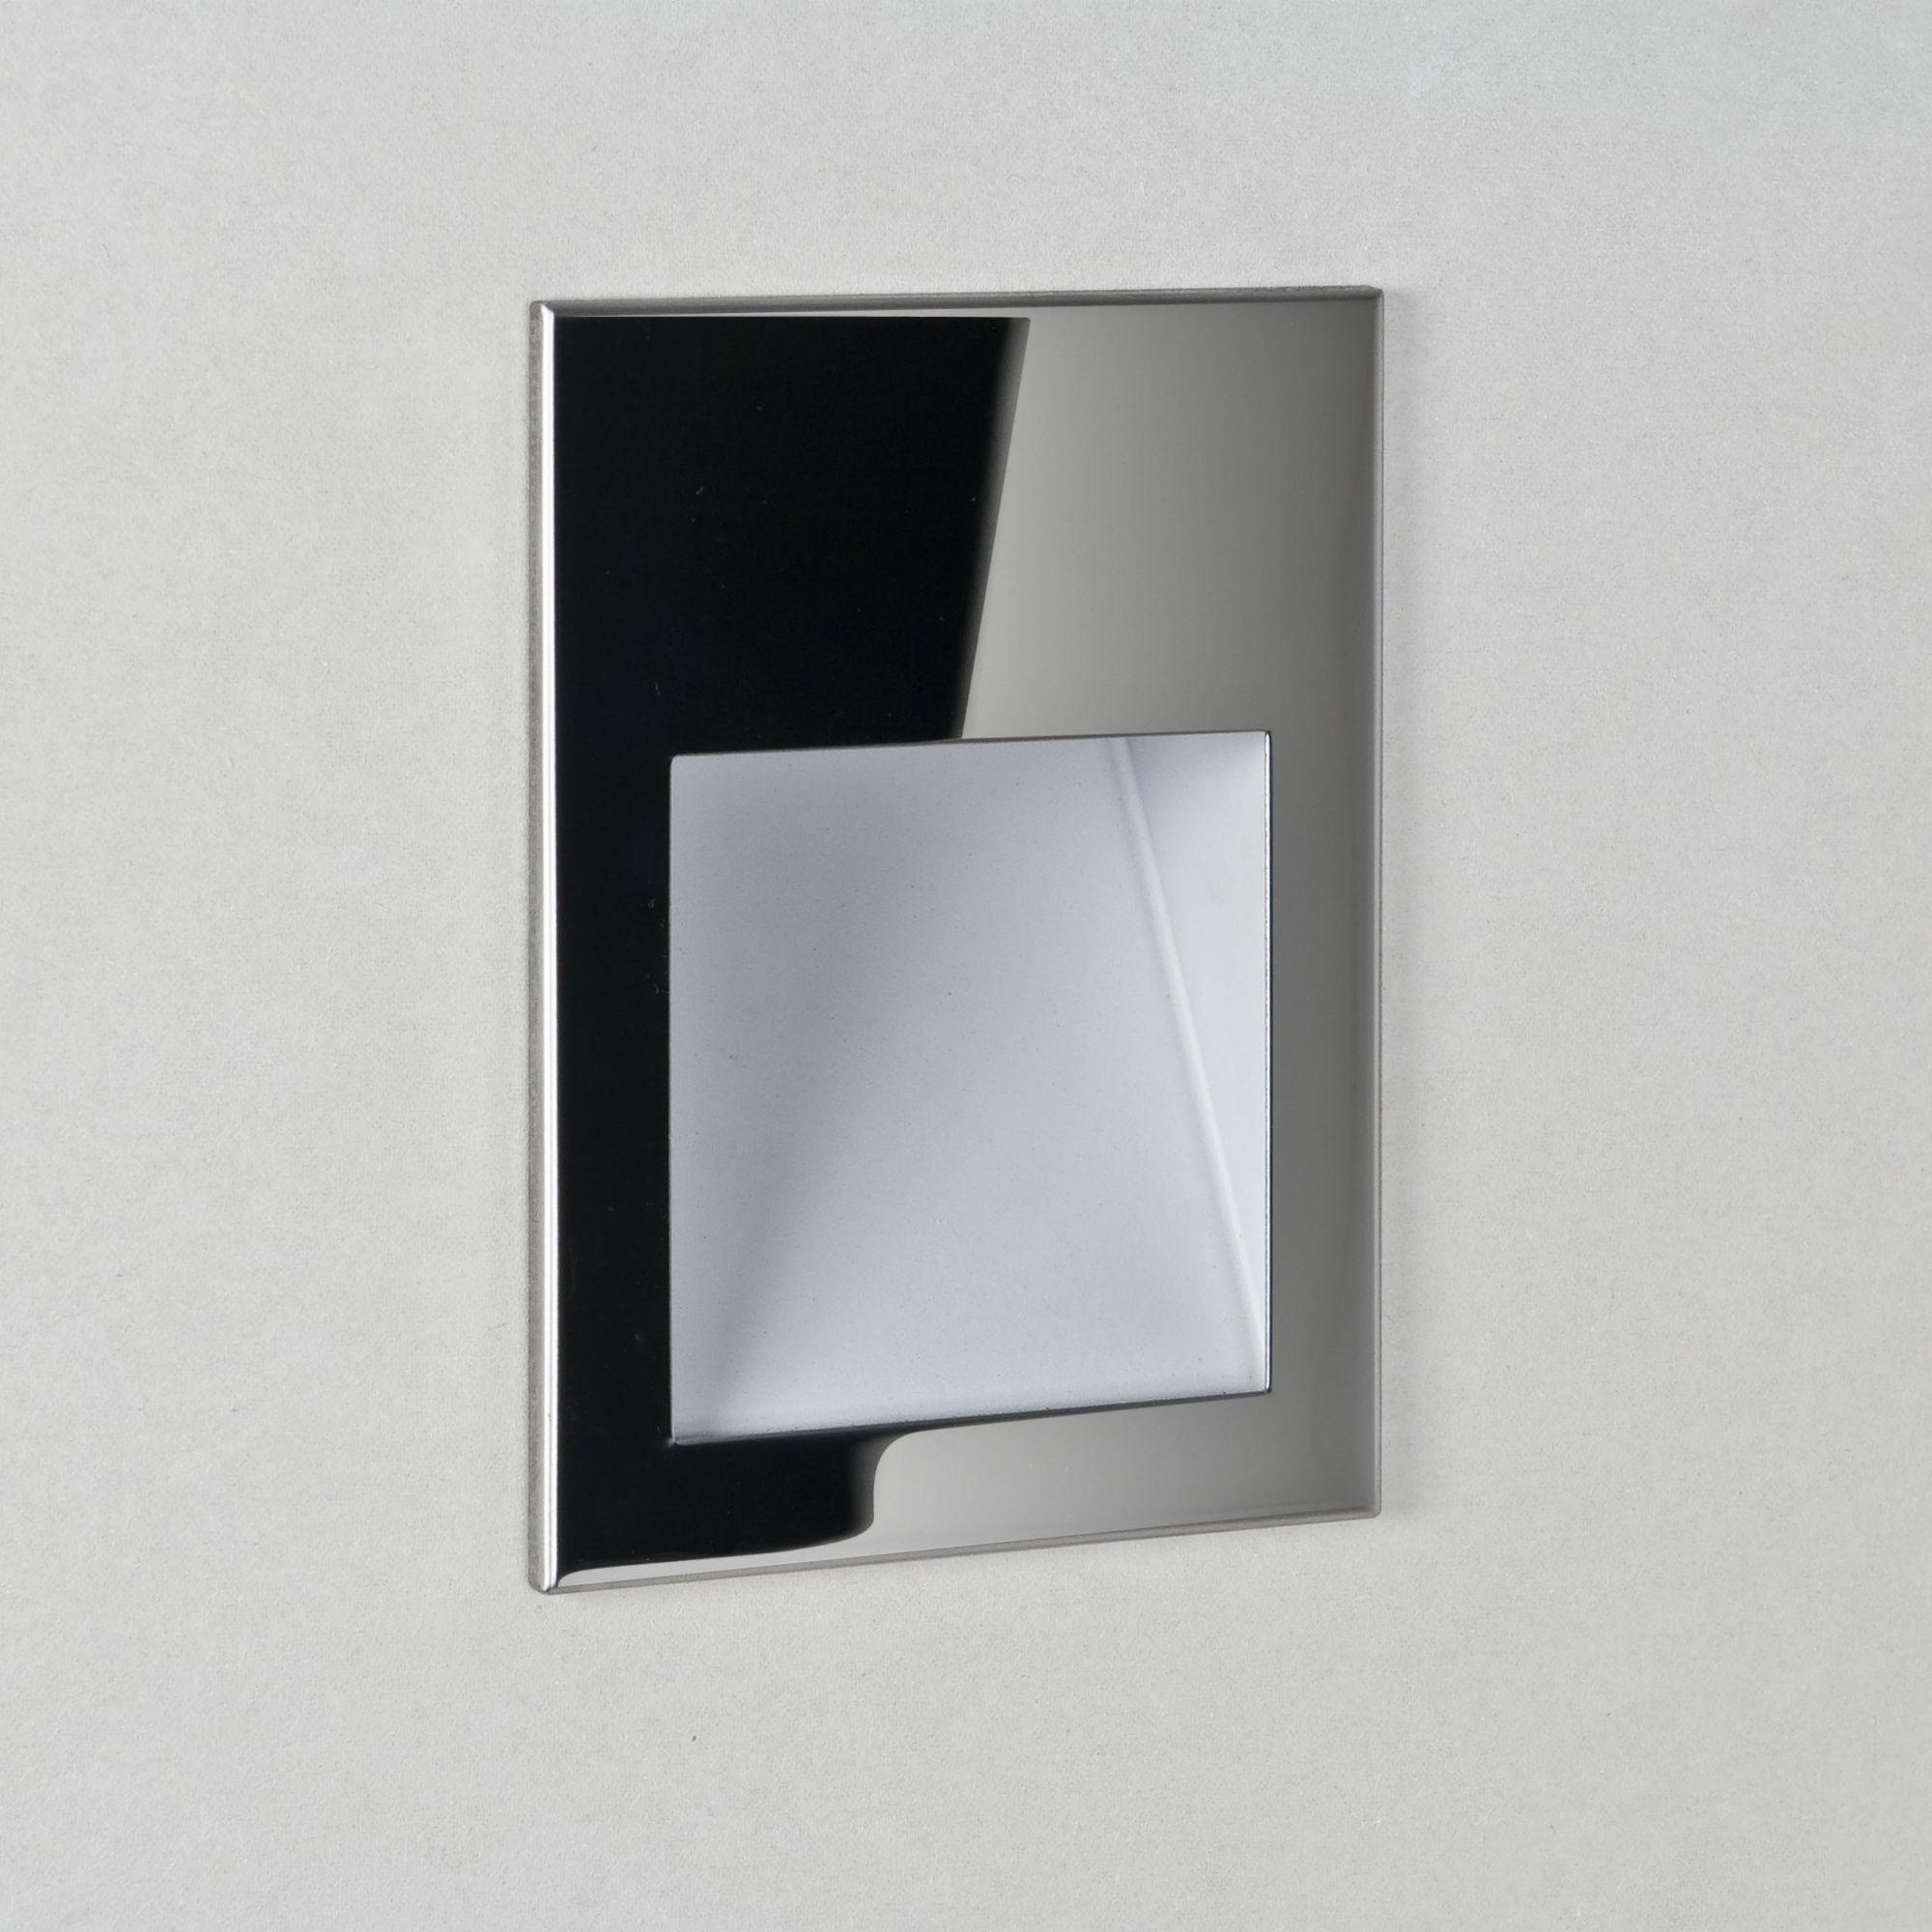 Lampa schodowa Borgo 54 LED 7546 Astro Lighting